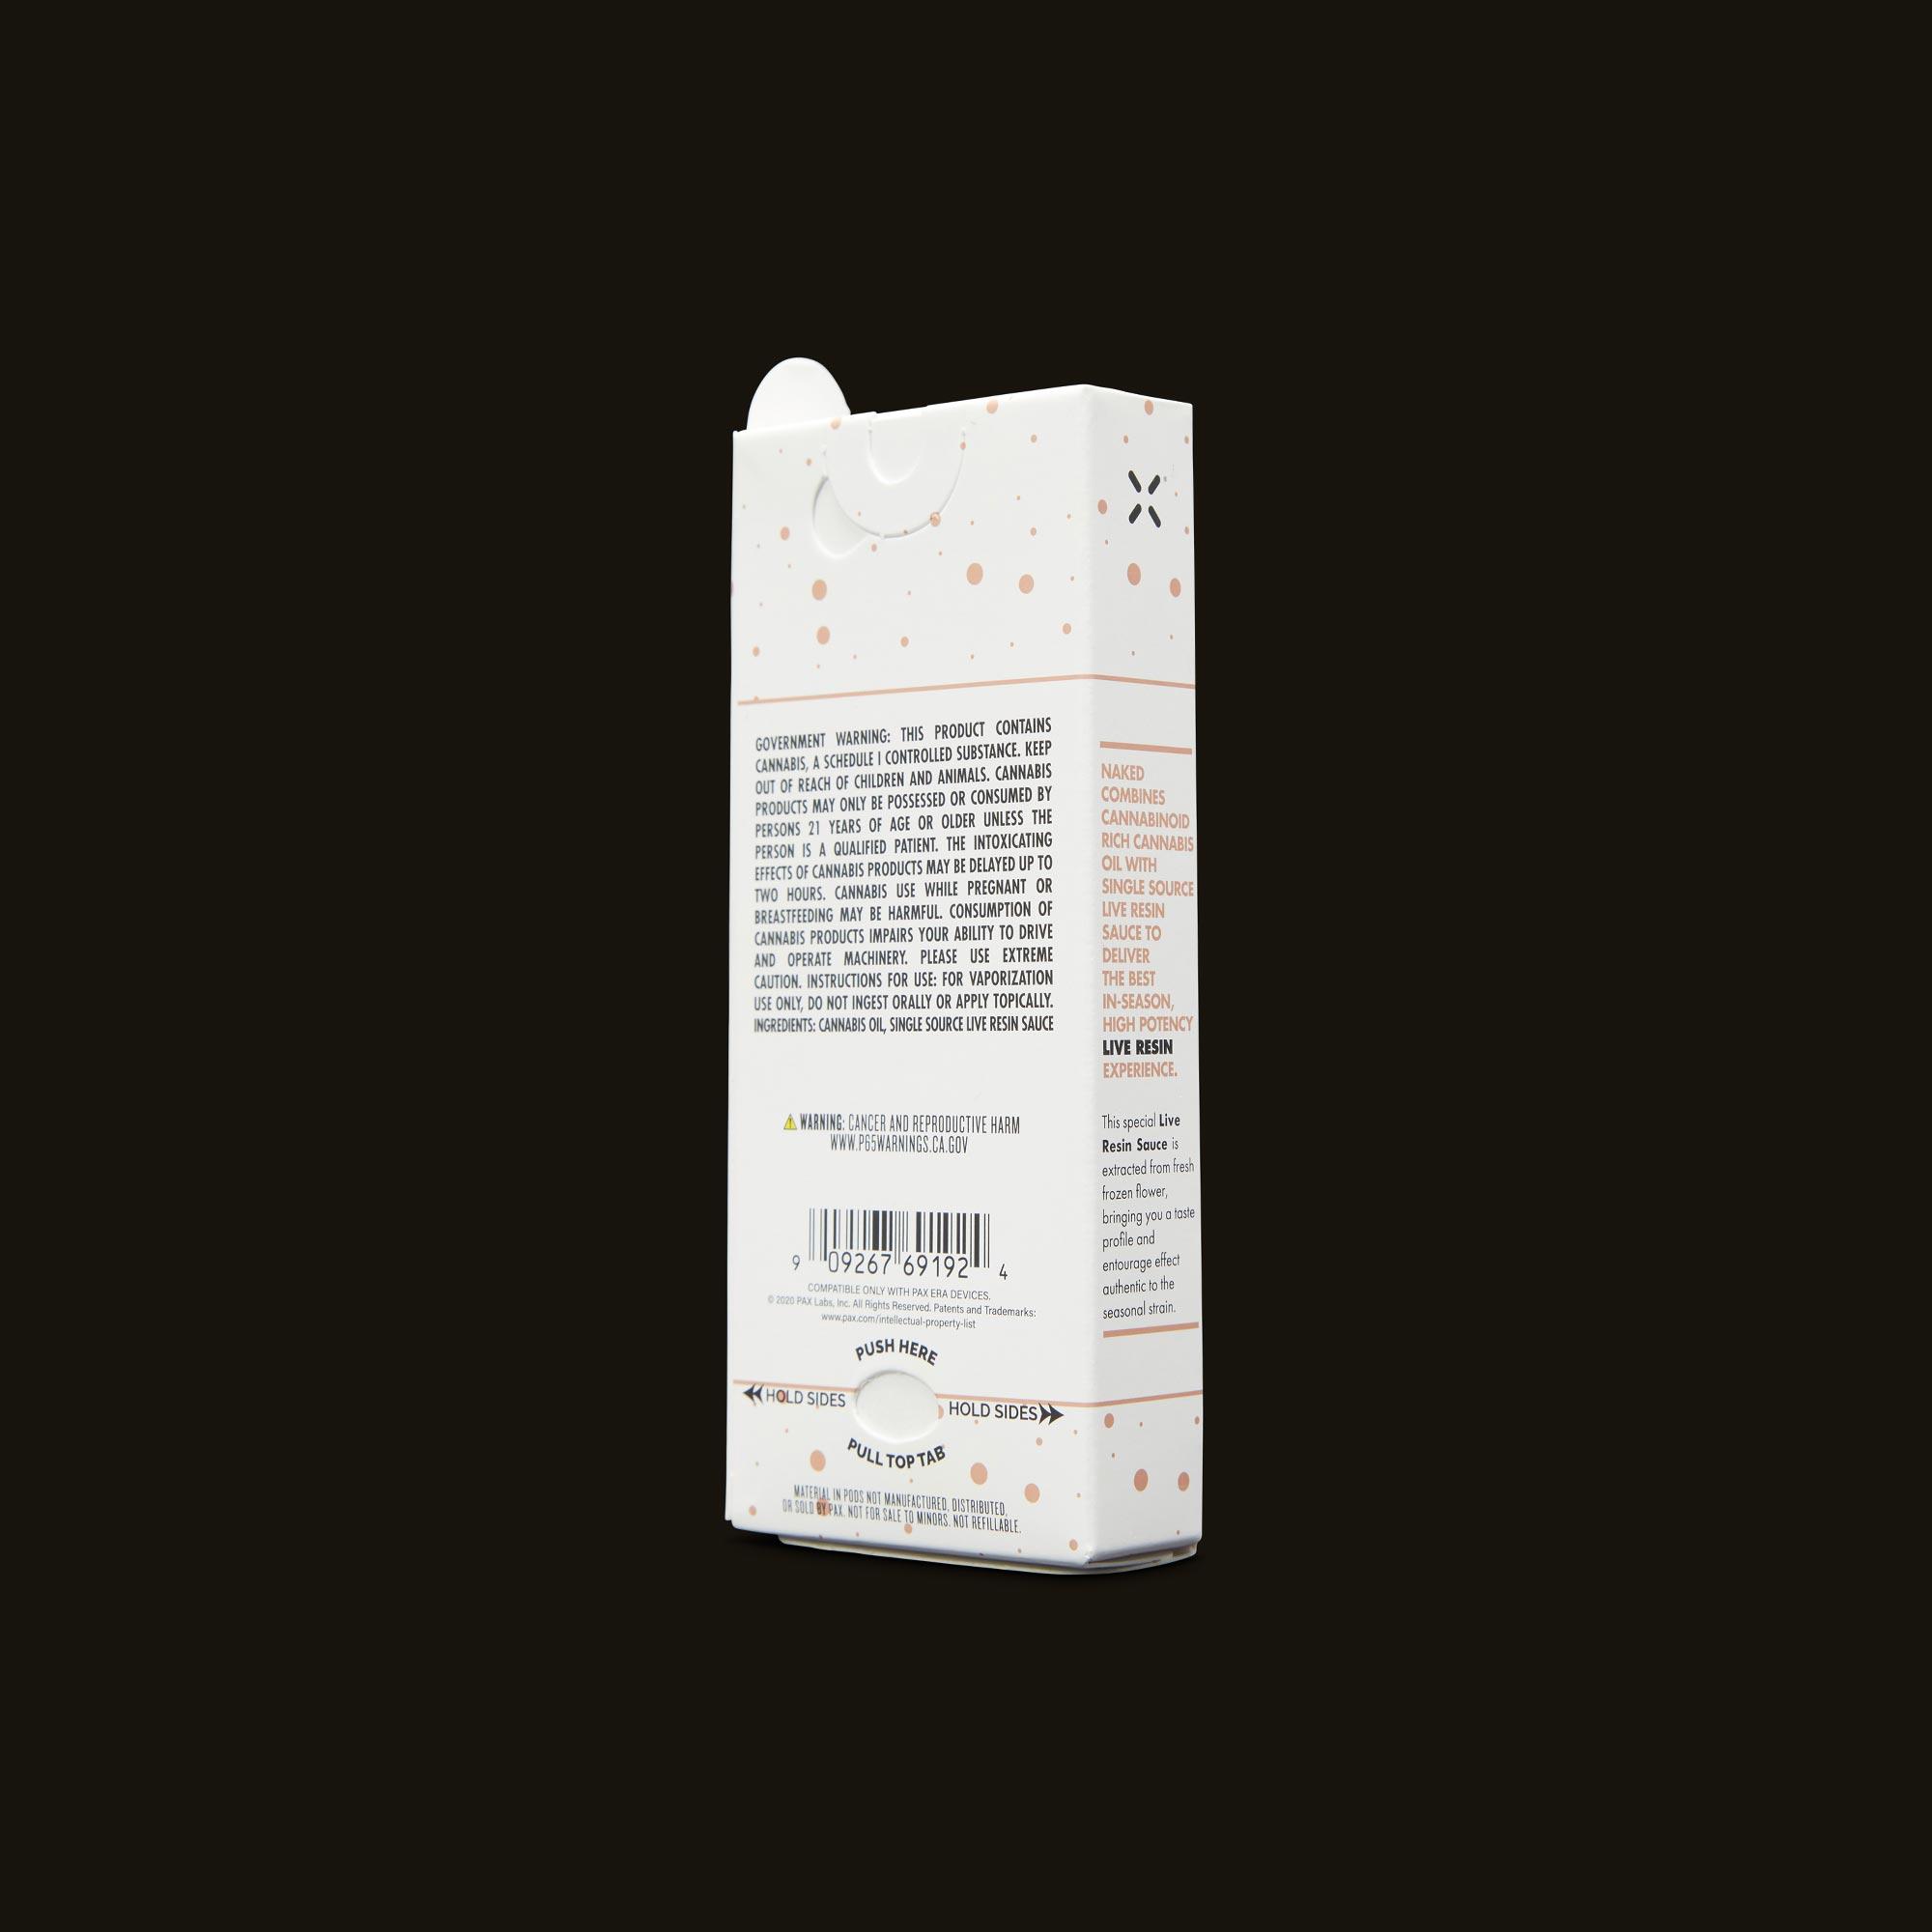 LEUNE Naked Tangie Live Resin PAX Era Pod Back Packaging